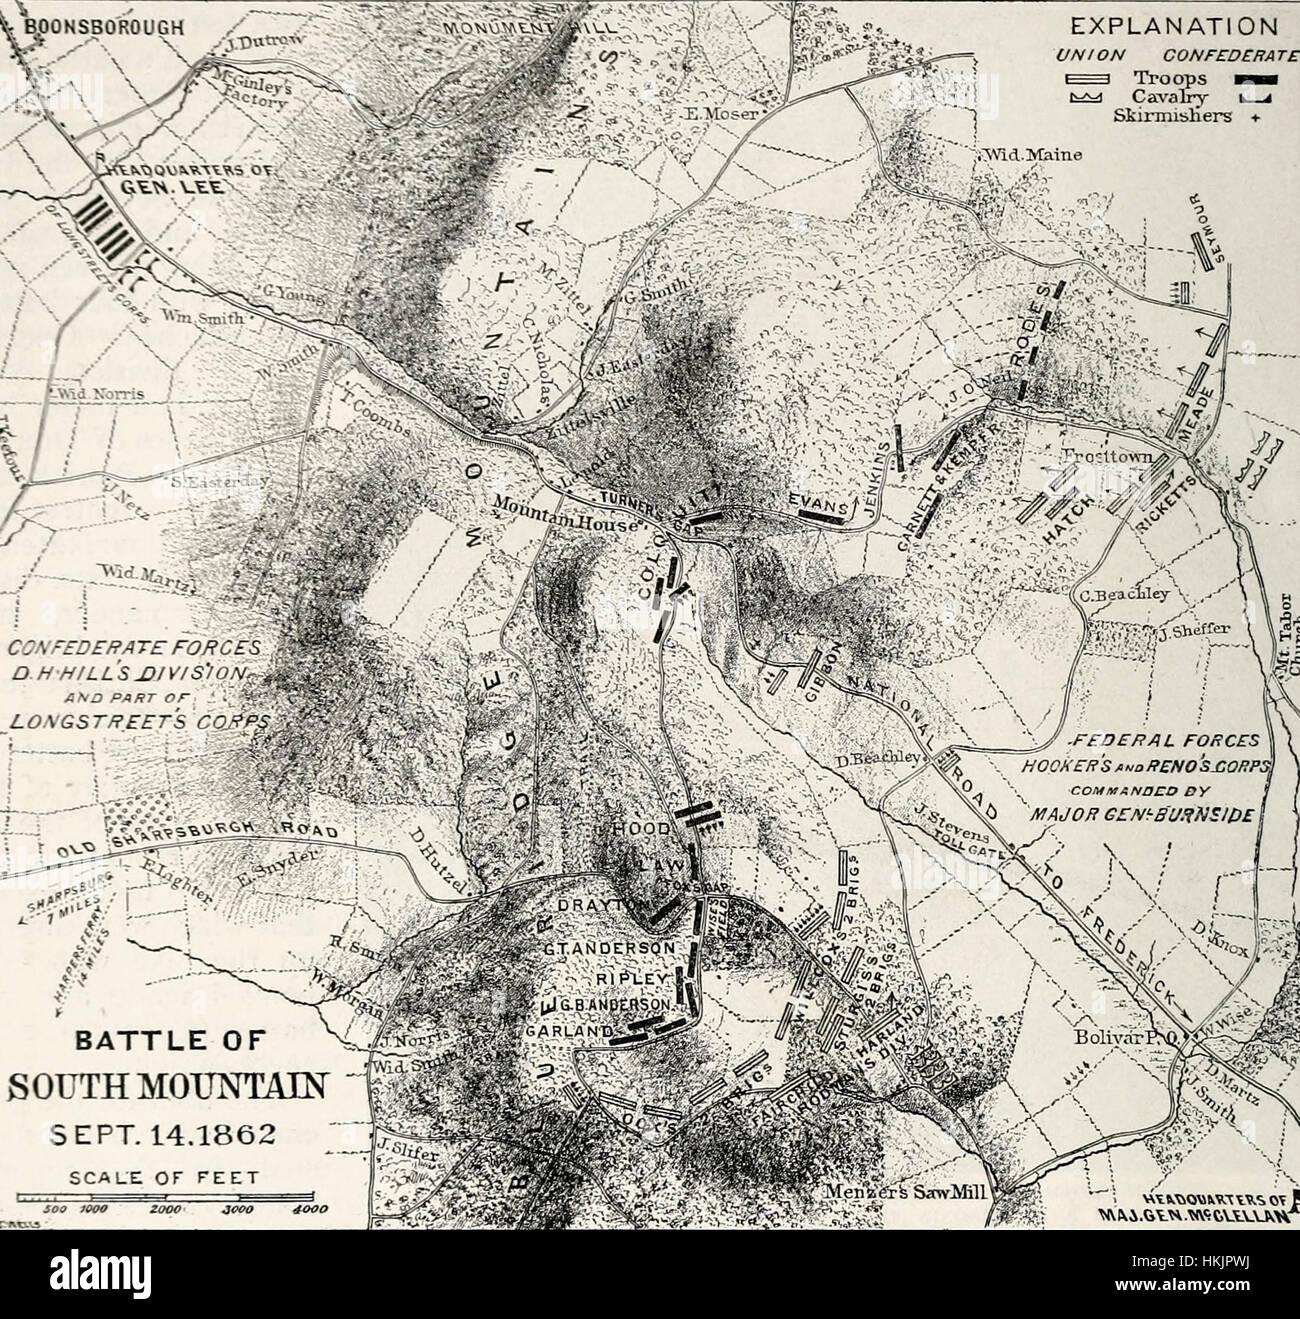 Map Of Battle Of South Mountain September USA Civil War - Map of us during civil war